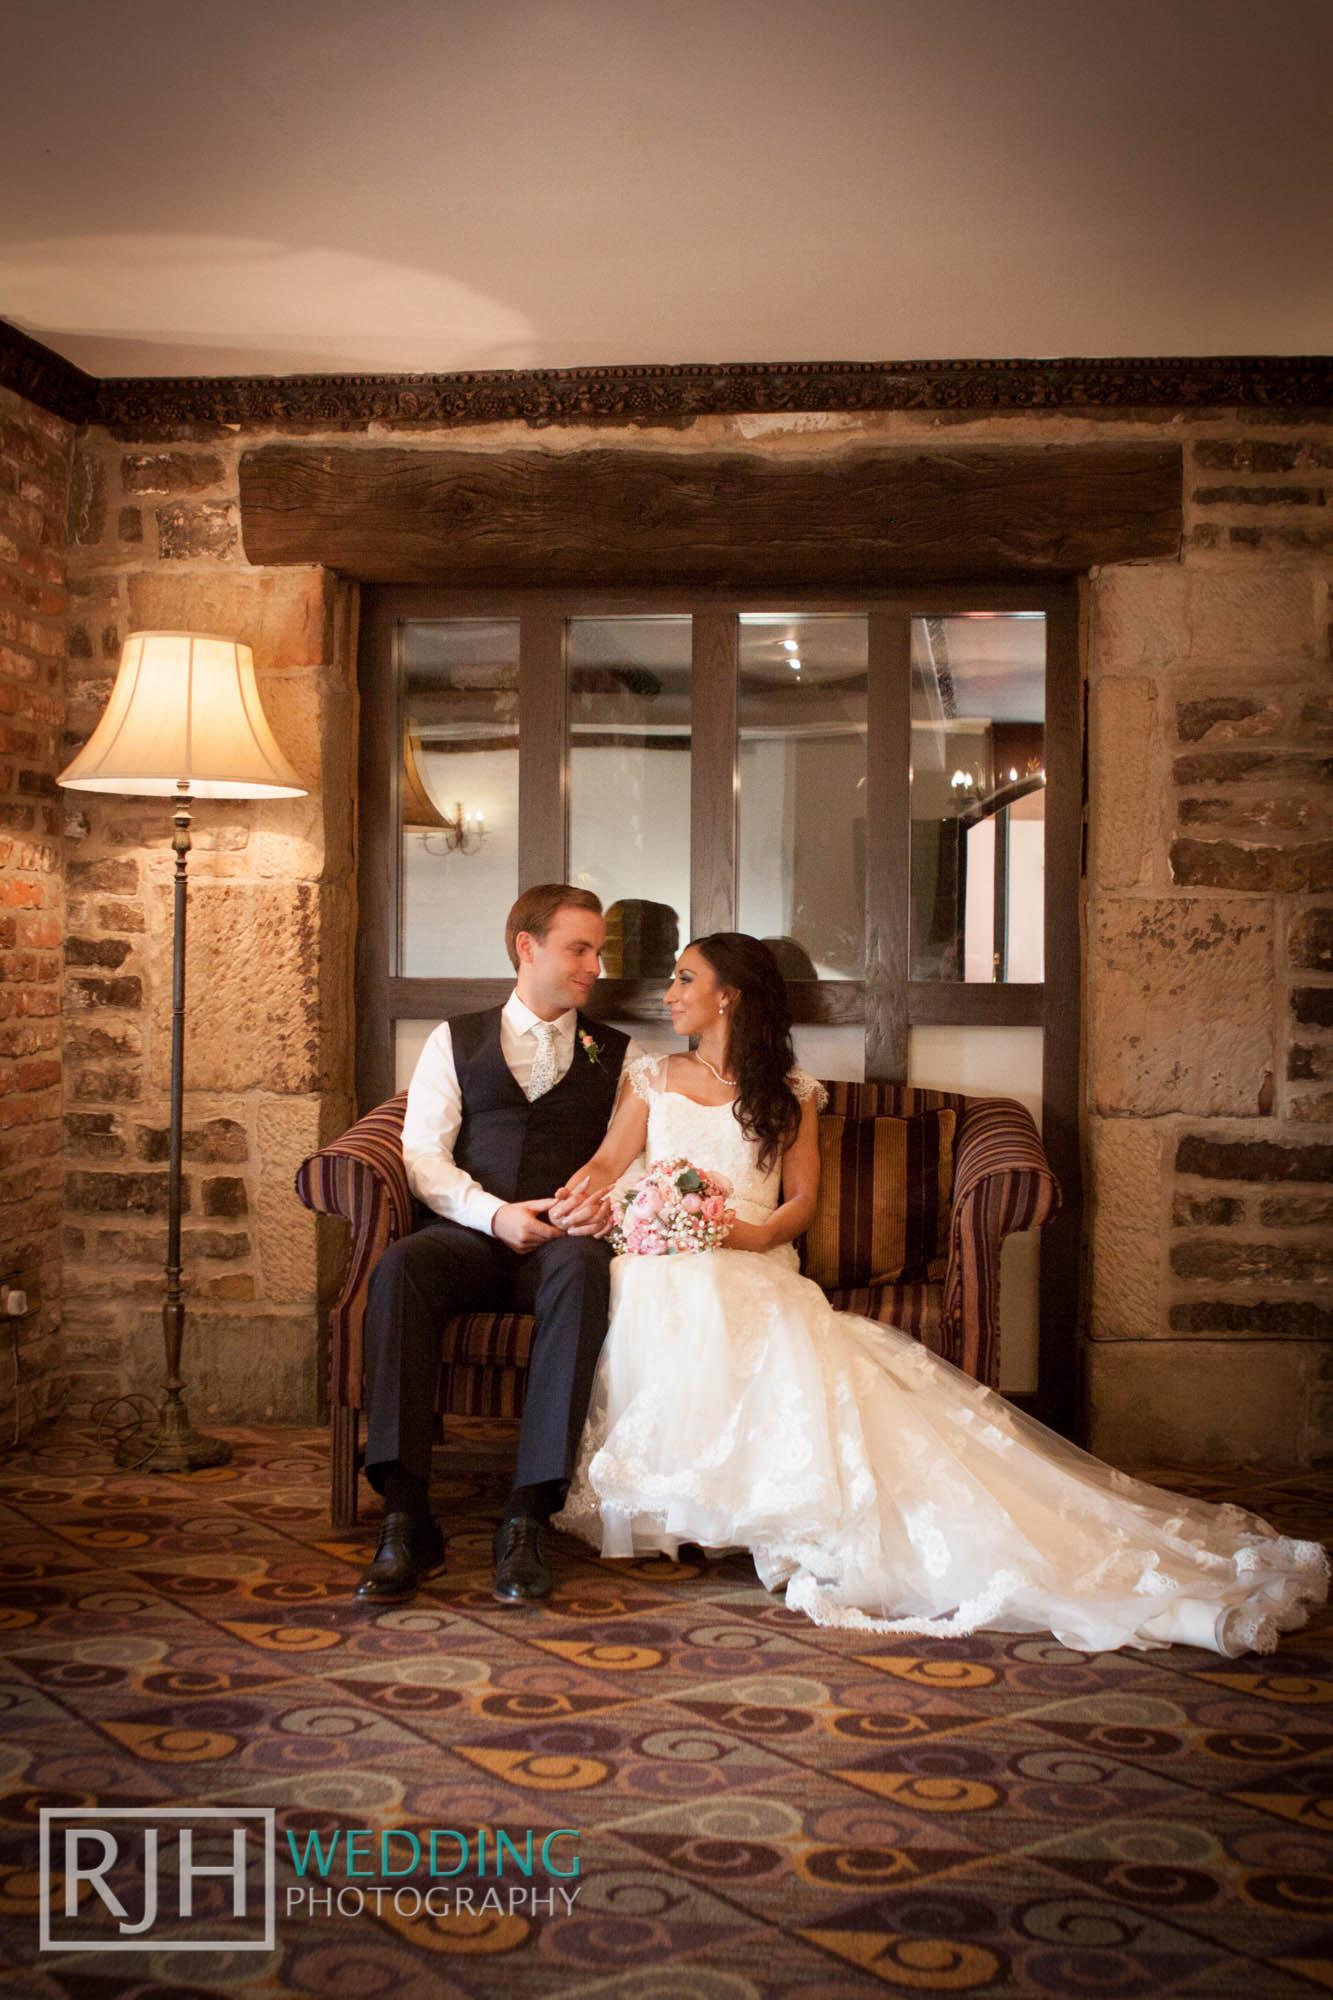 RJH Wedding Photography_2014 highlights_39.jpg